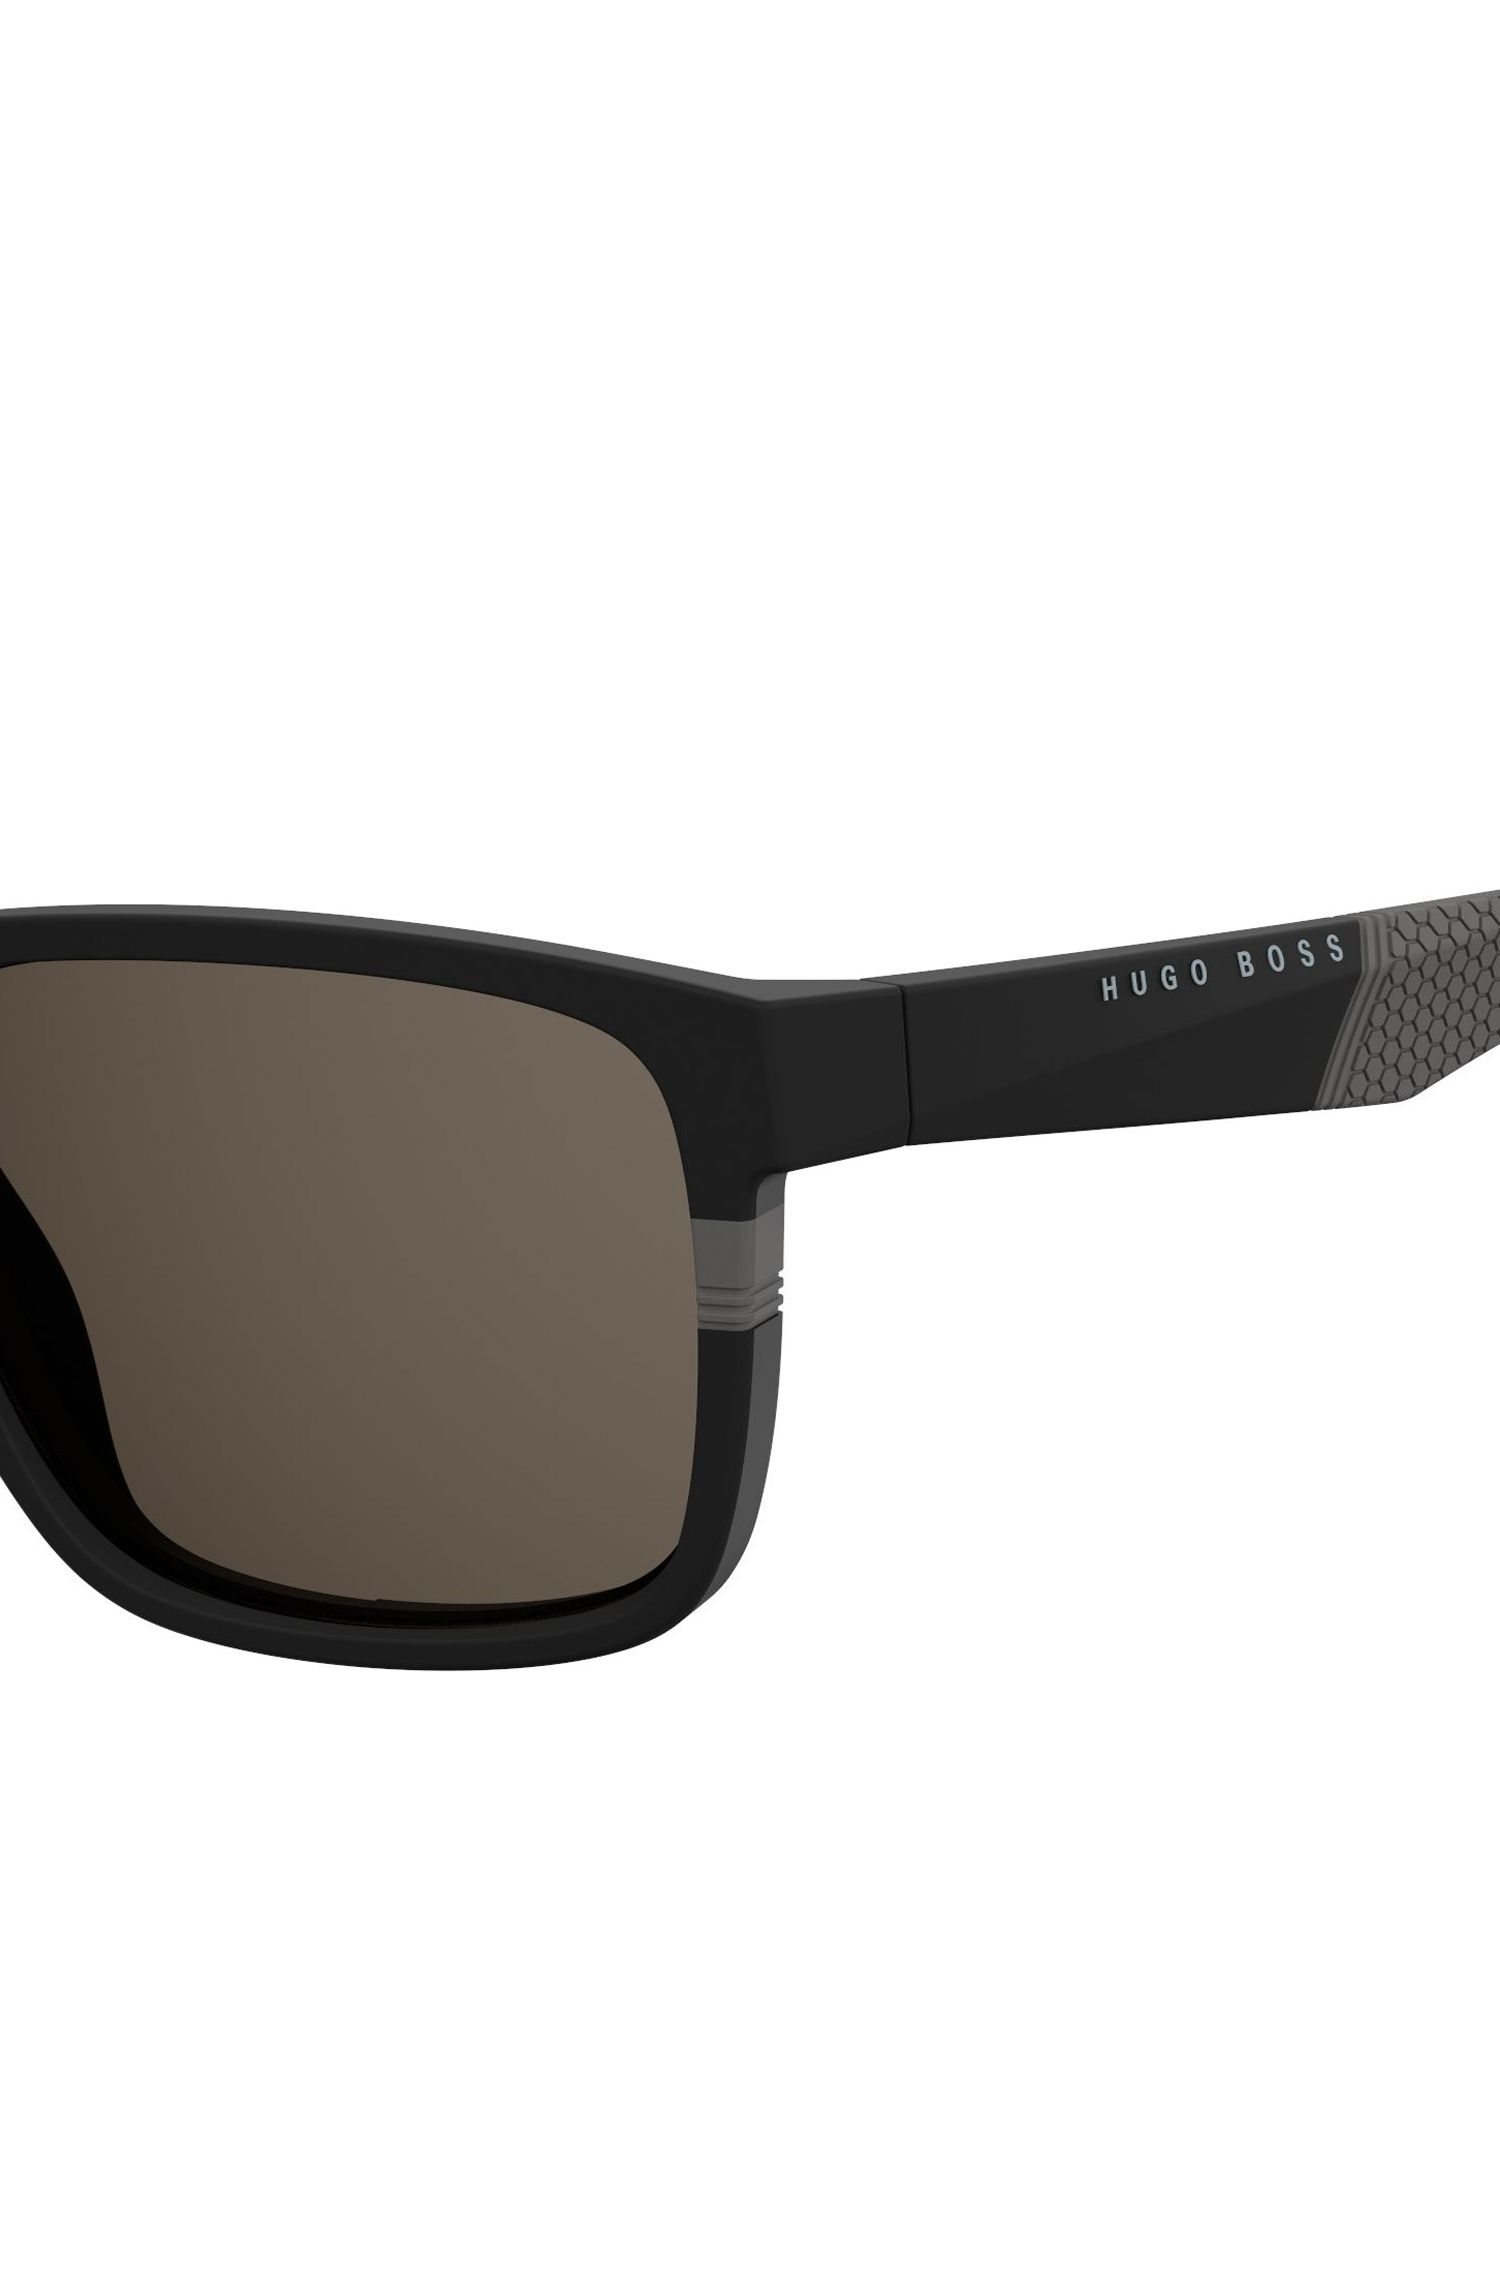 Black Rectangular Acetate Sunglasses | BOSS 0916/S, Assorted-Pre-Pack